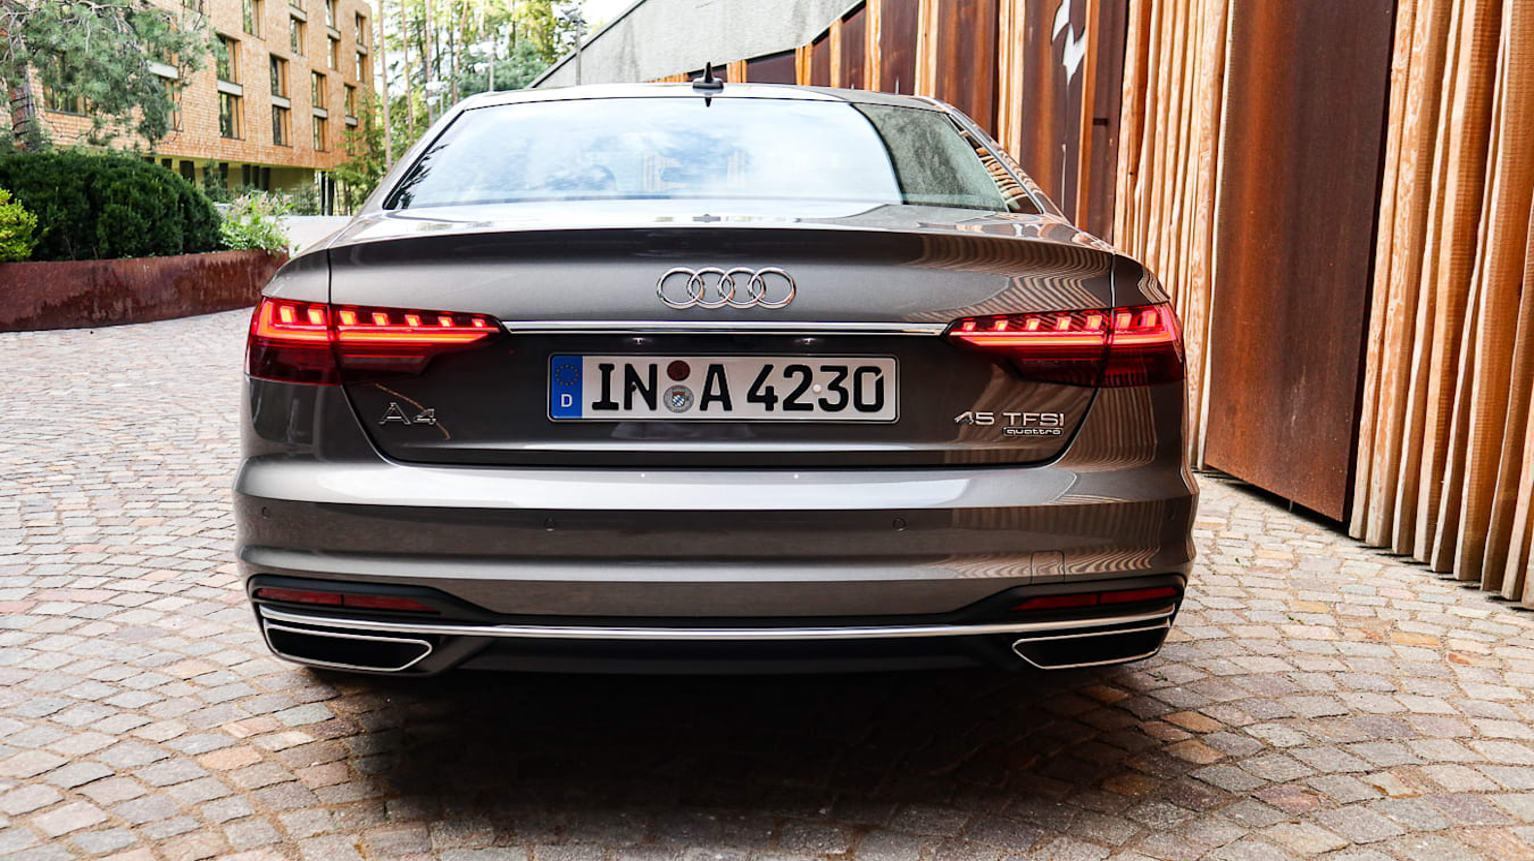 2020 Audi A4 45 TFSI quattro